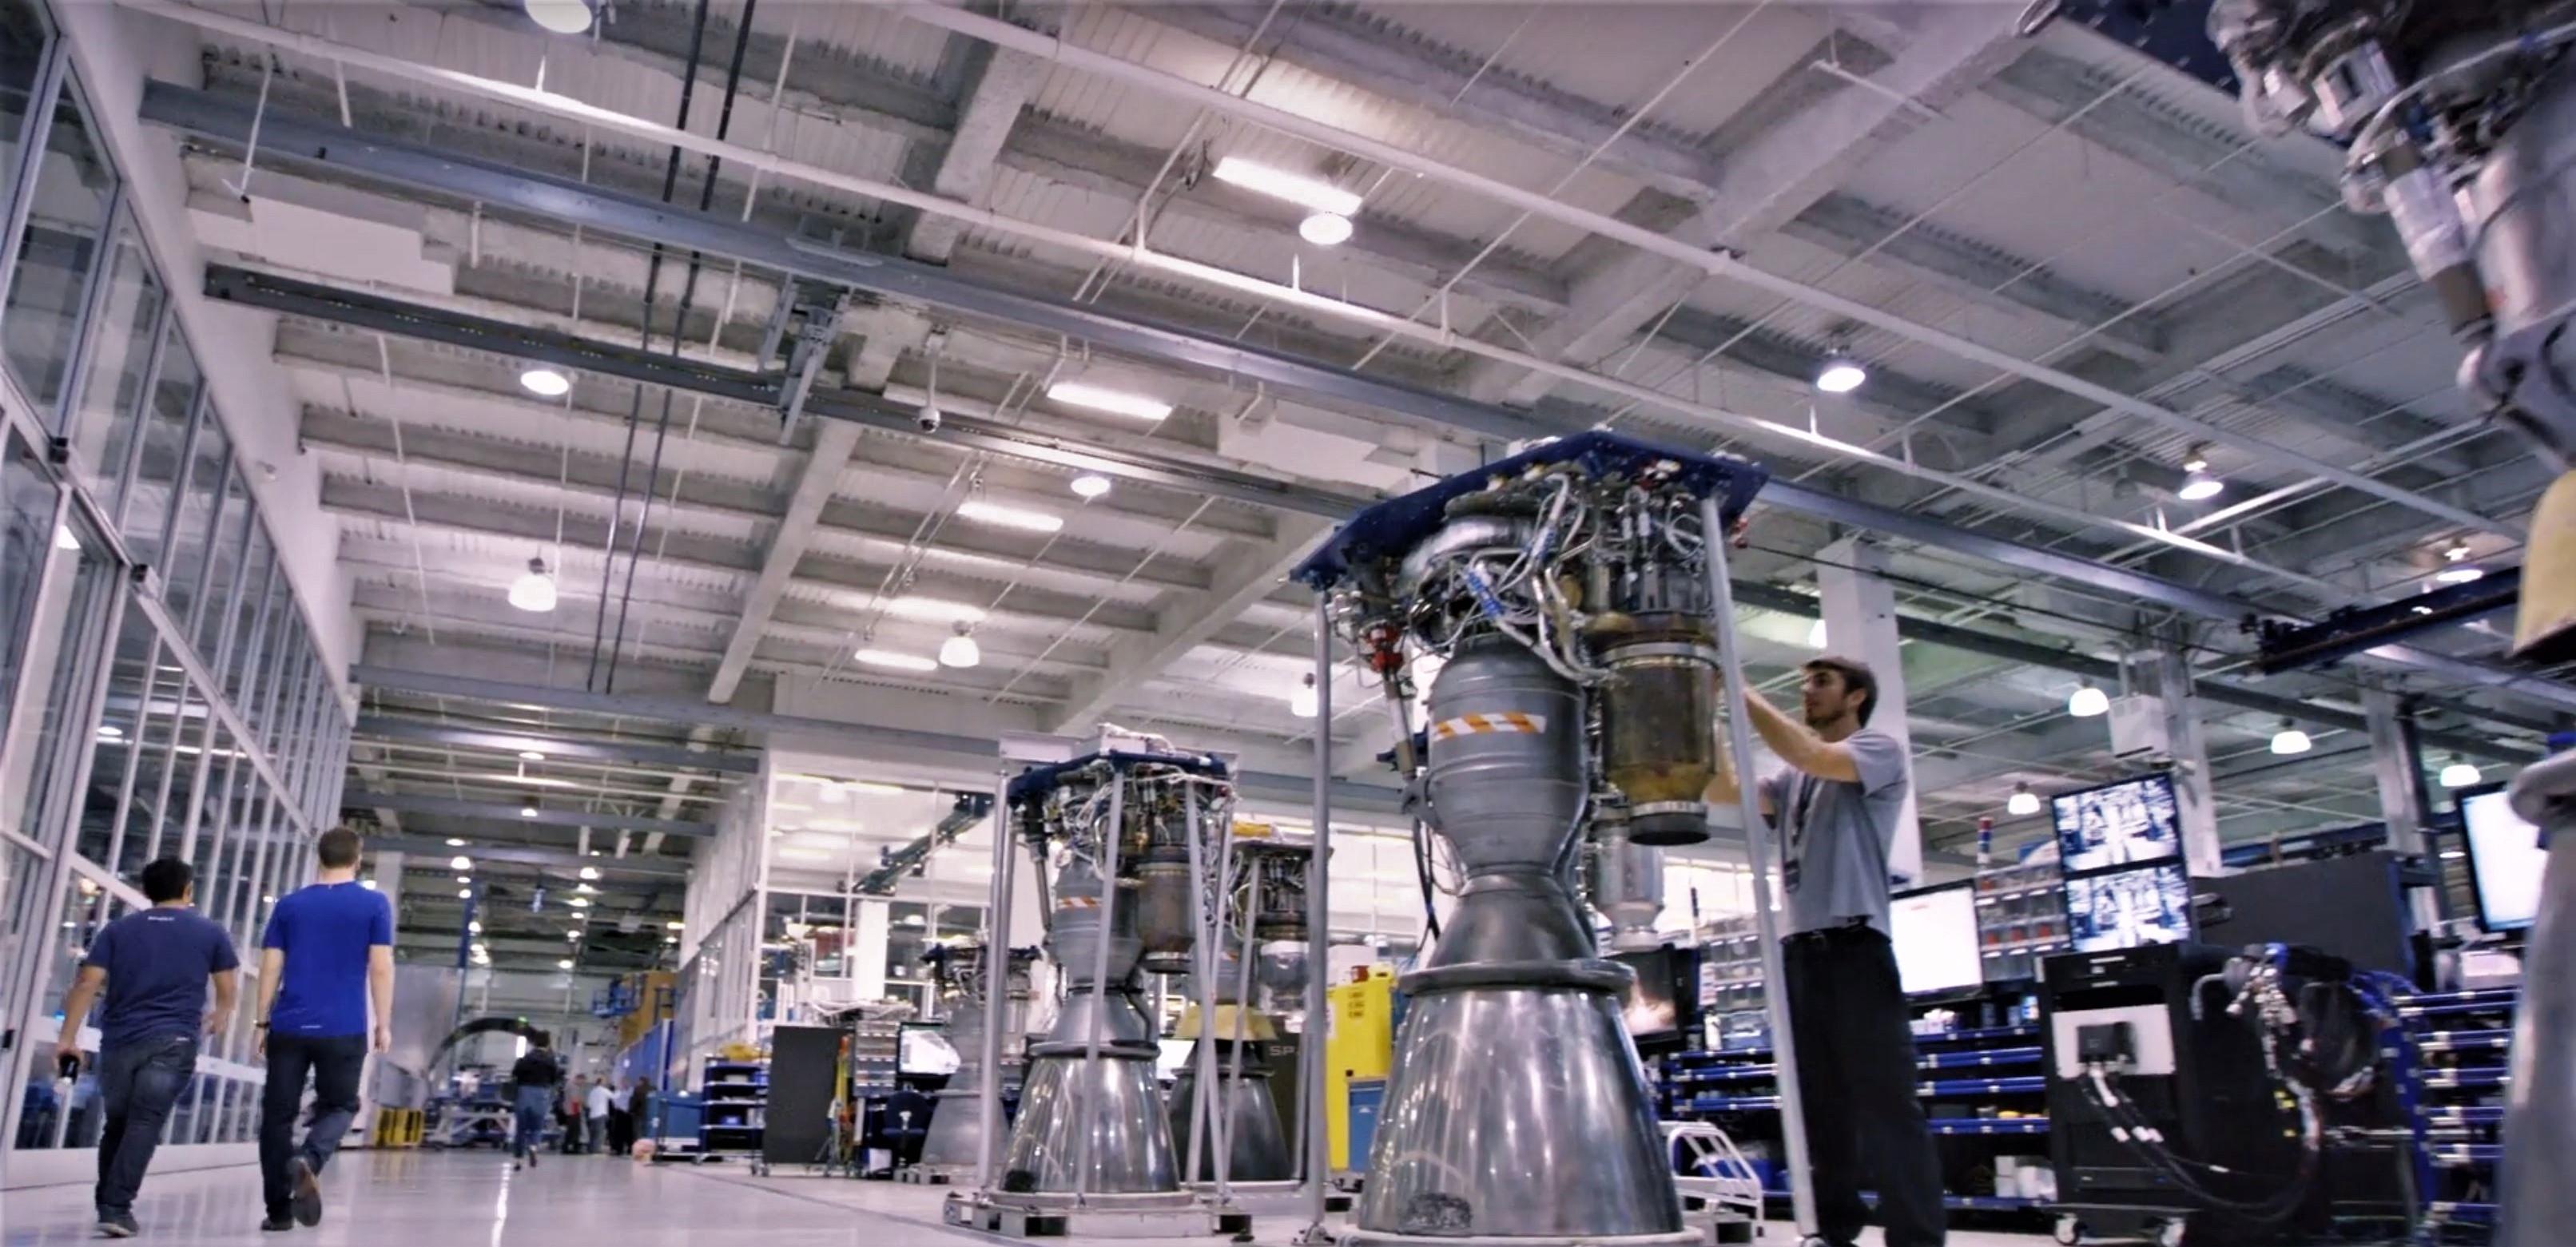 spacex hawthorne facility - HD3224×1561